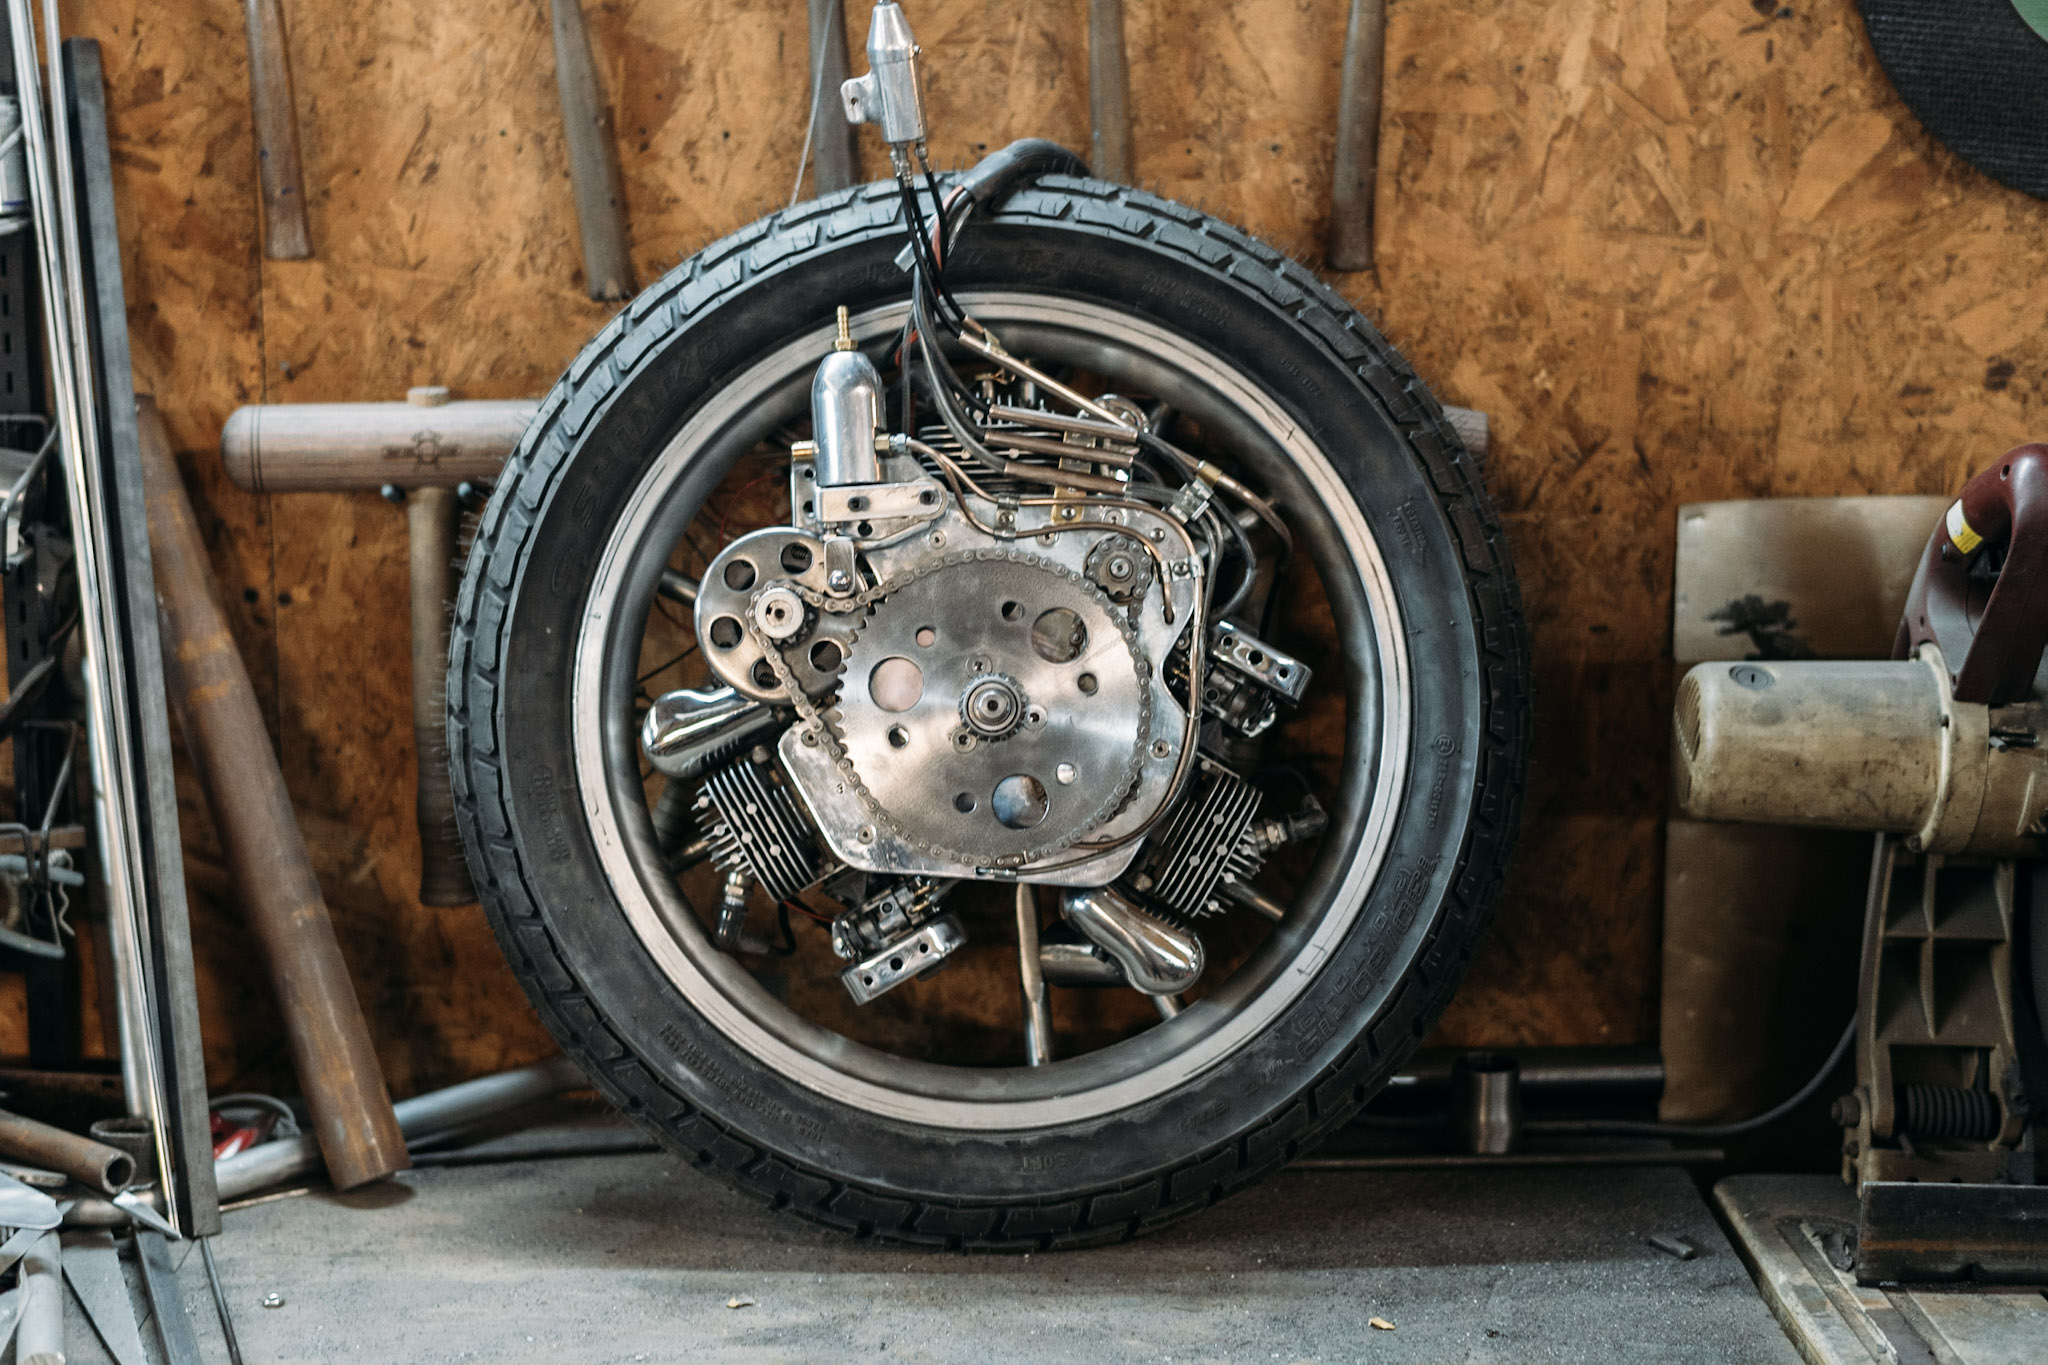 Craig Rodsmith's engine-wheeled custom bike, 'The Killer'